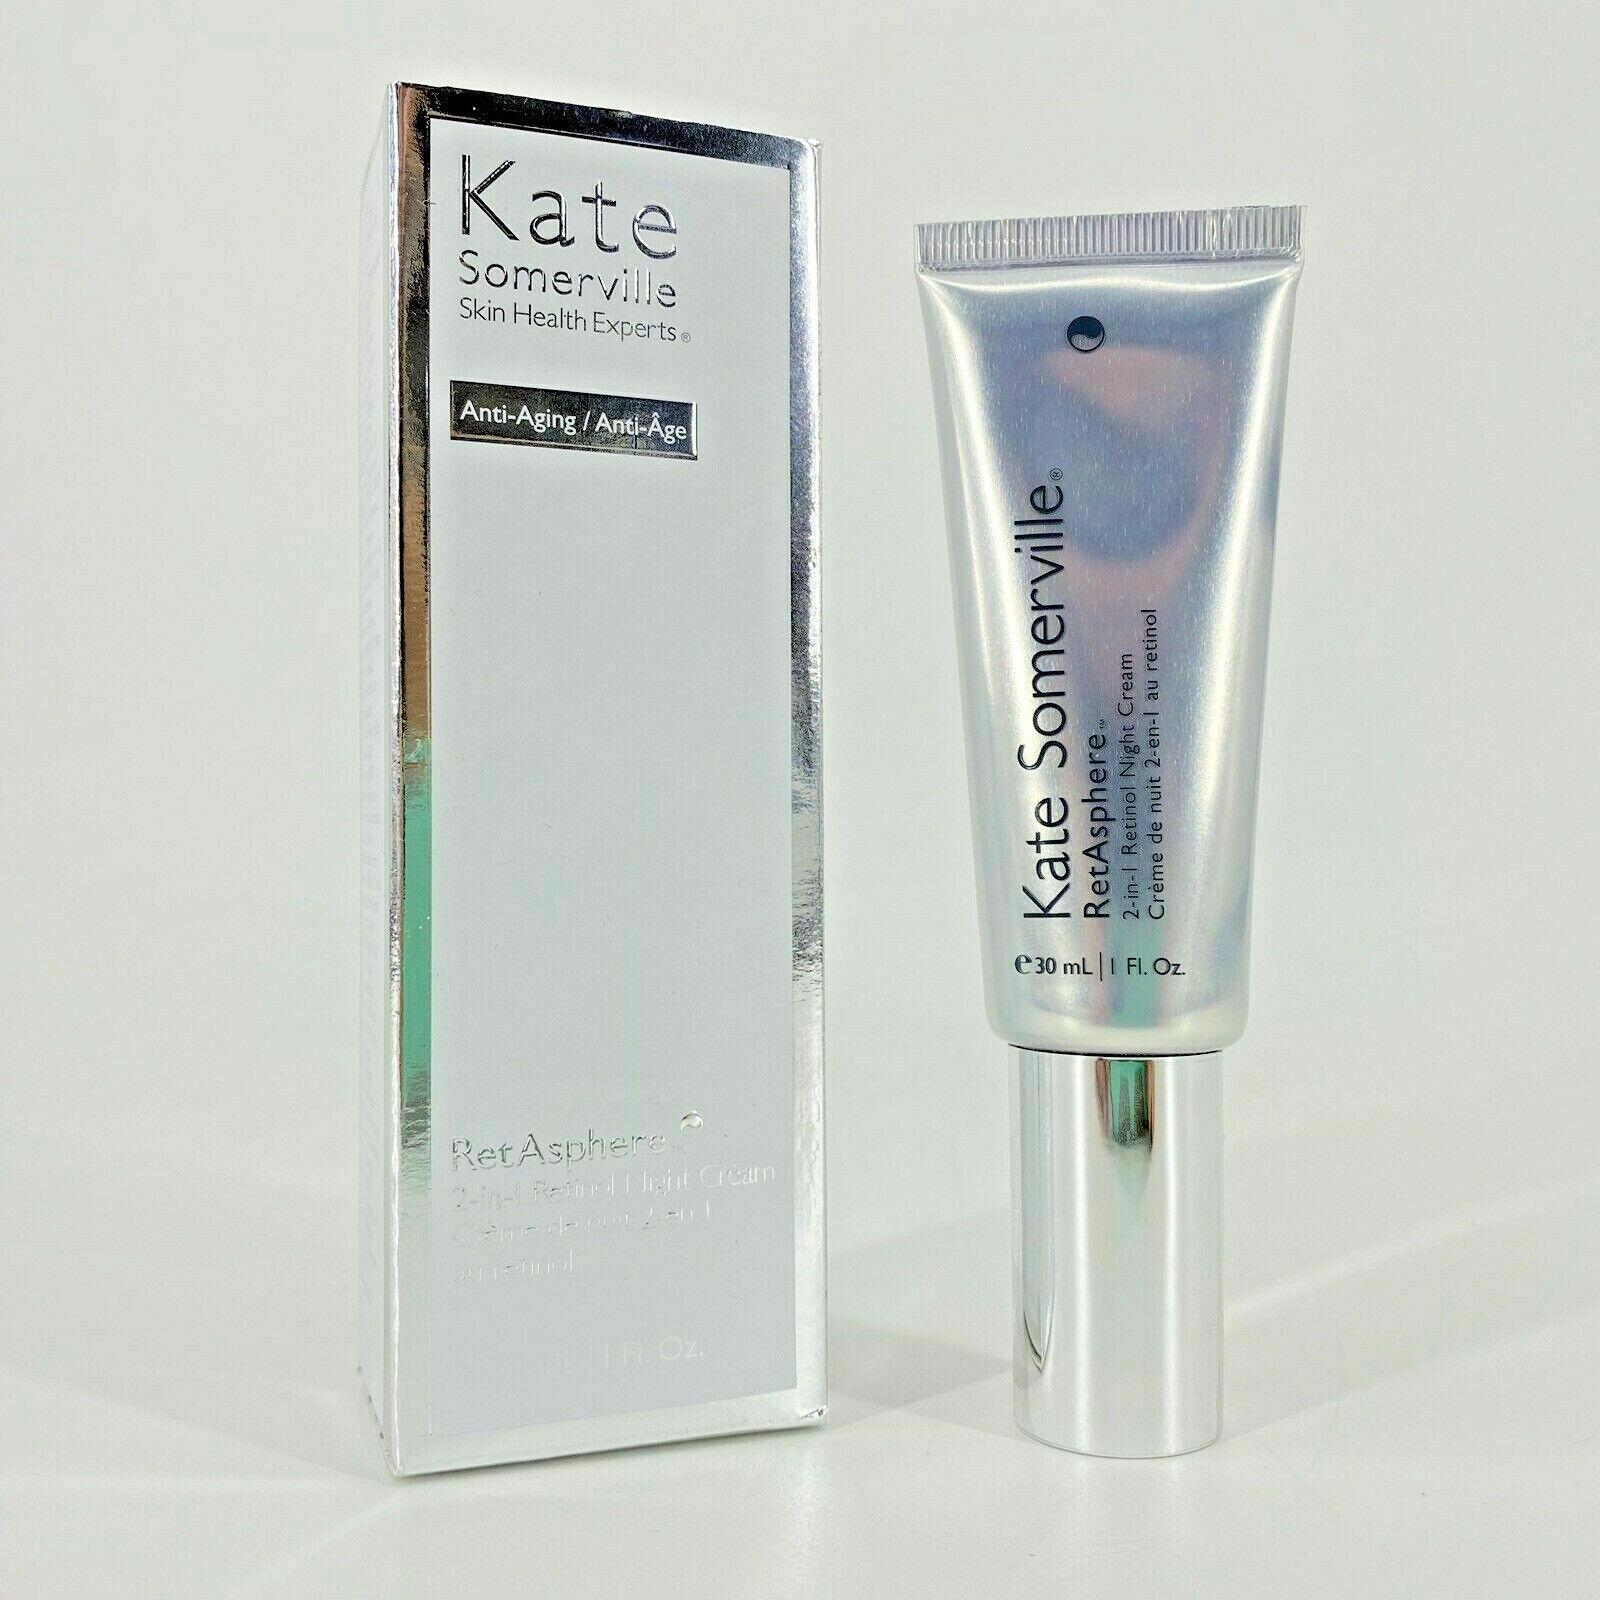 Kate Somerville RetAsphere 2-in-1 Retinol Night Cream - Anti